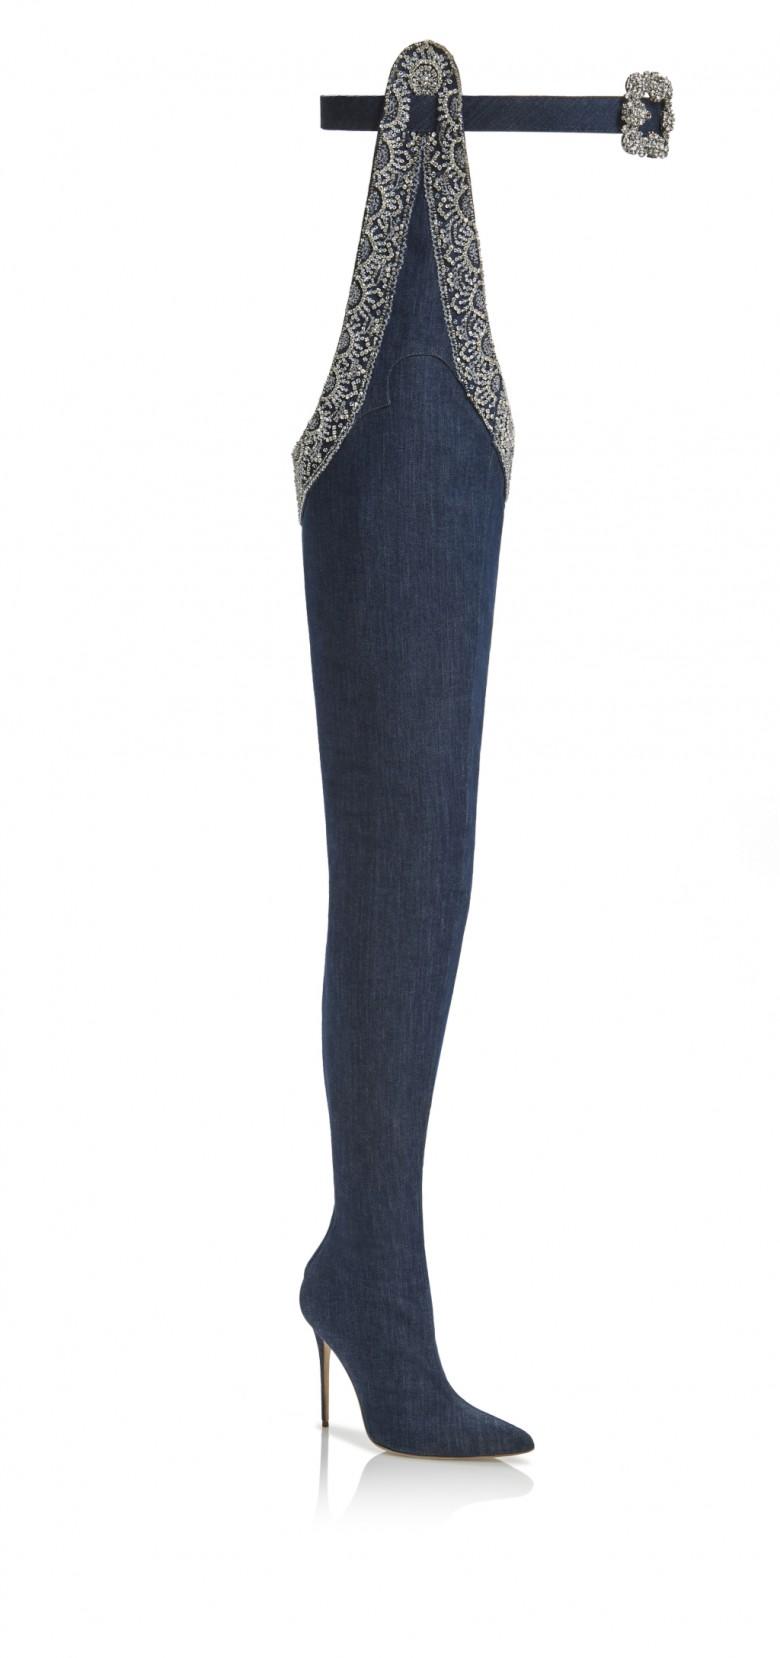 Rihanna x Manolo Blahnik Denim Desserts Collection - 9 to 5 thigh high boot